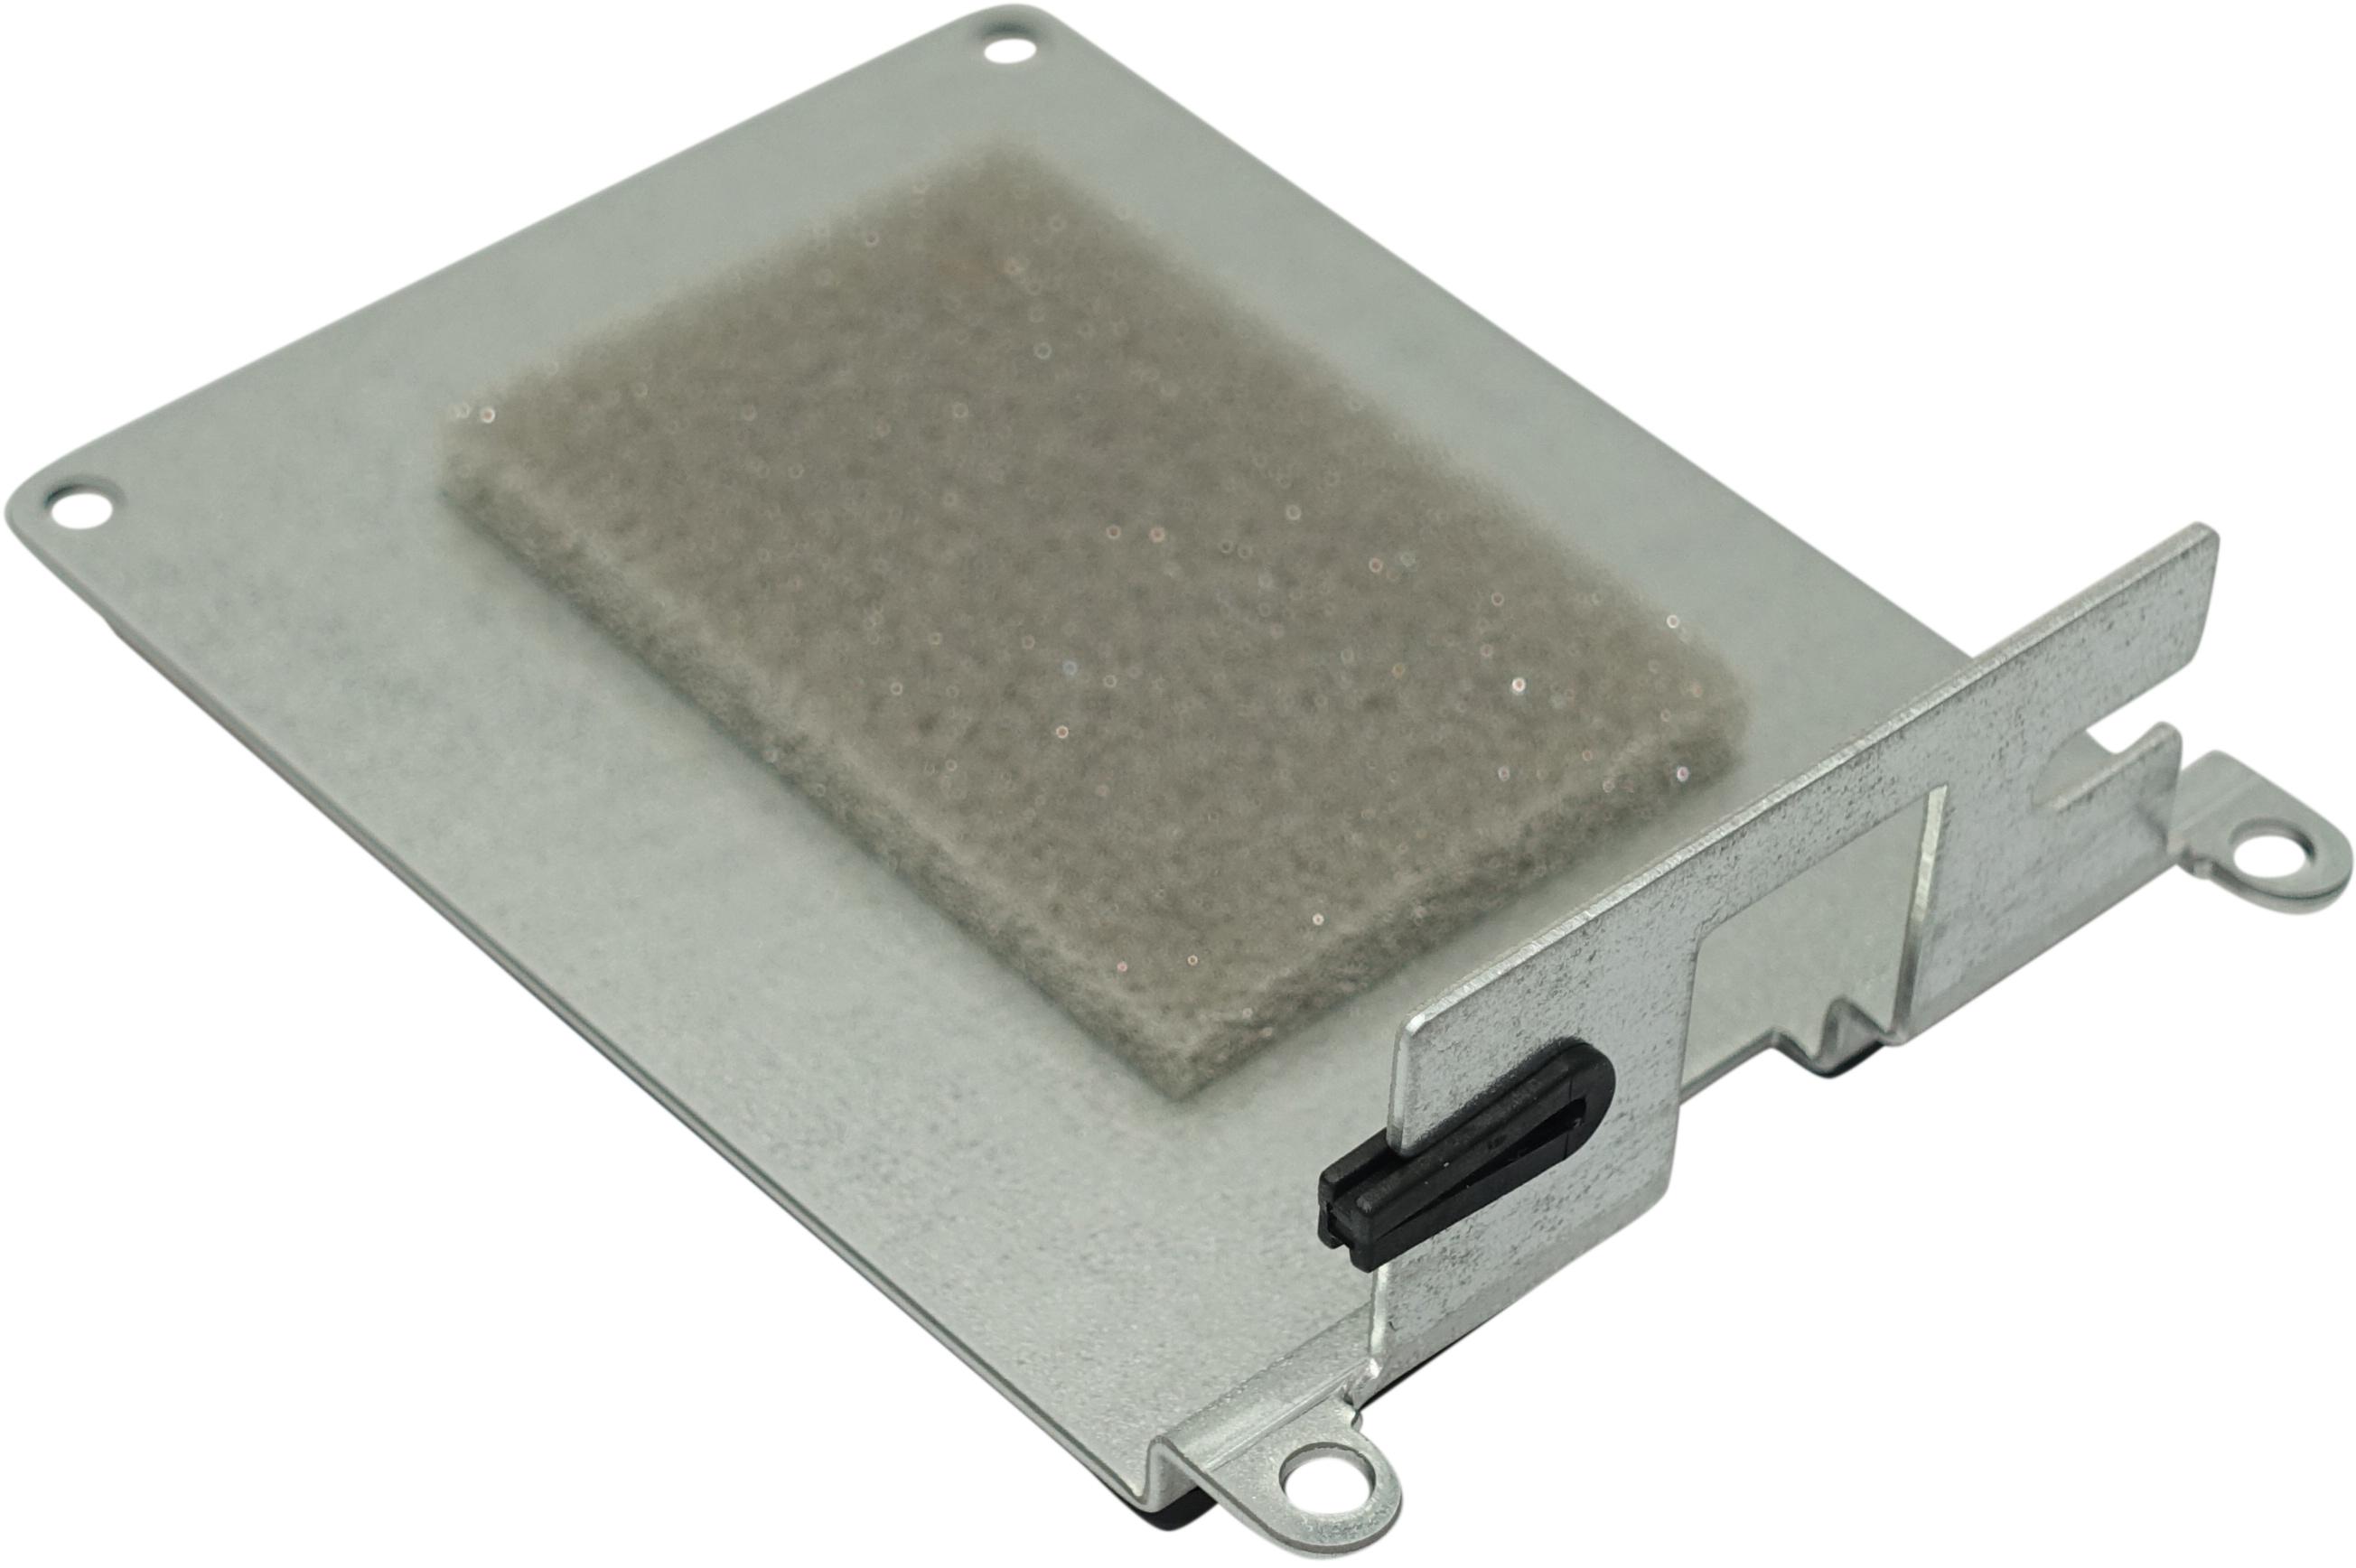 Ibanez TS808 bottom plate